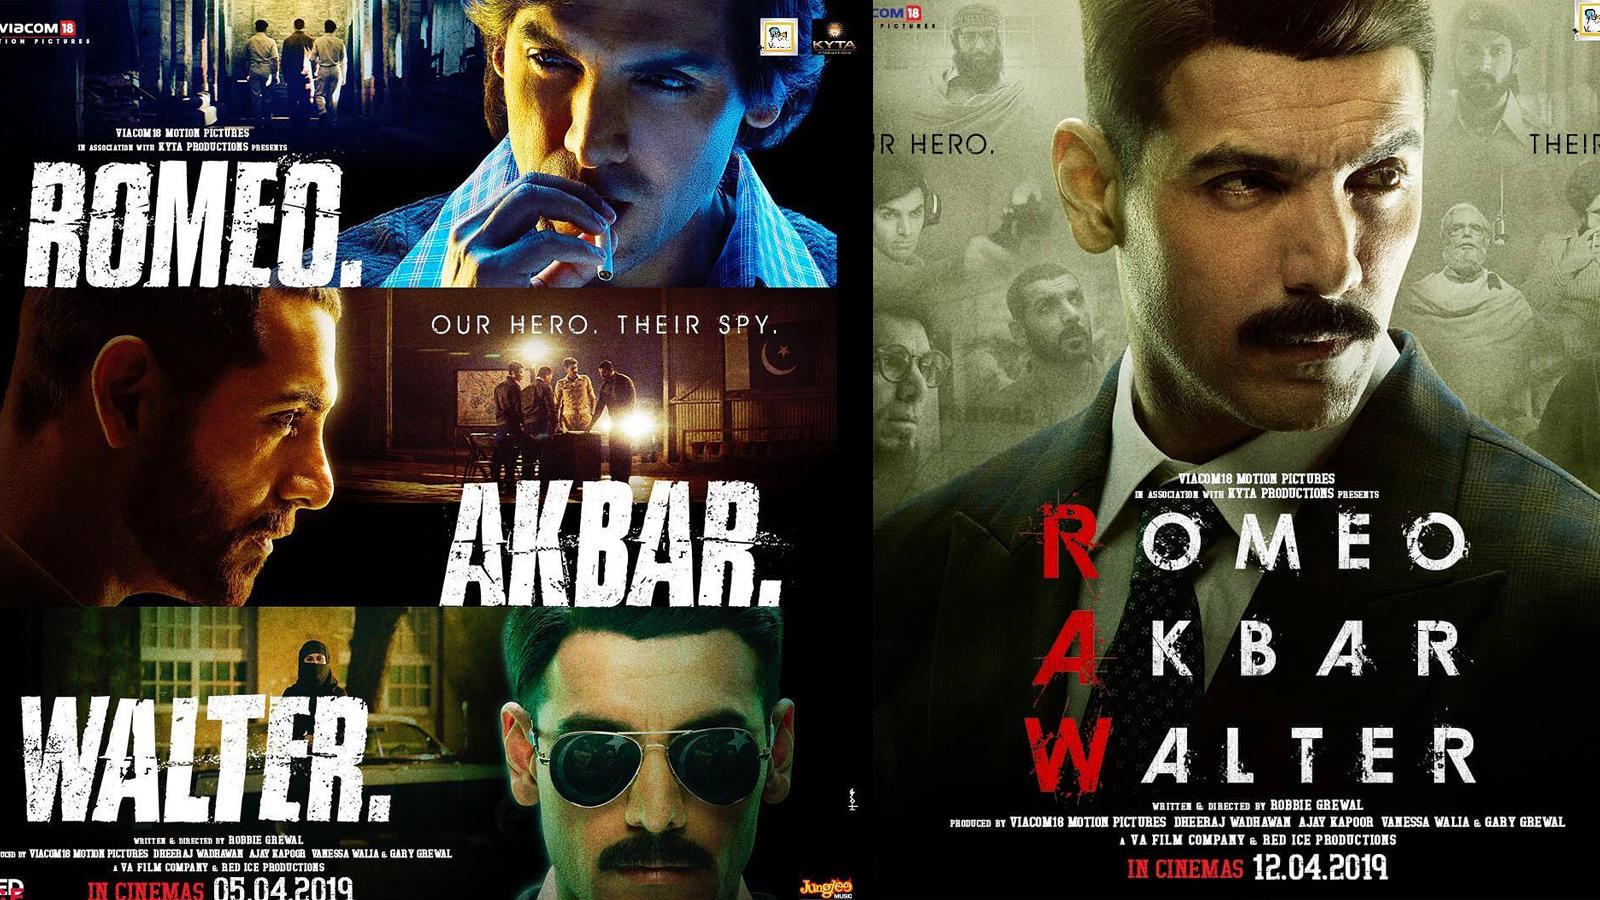 Romeo, Akbar, Walter trailer: John Abraham looks promising as a patriotic spy